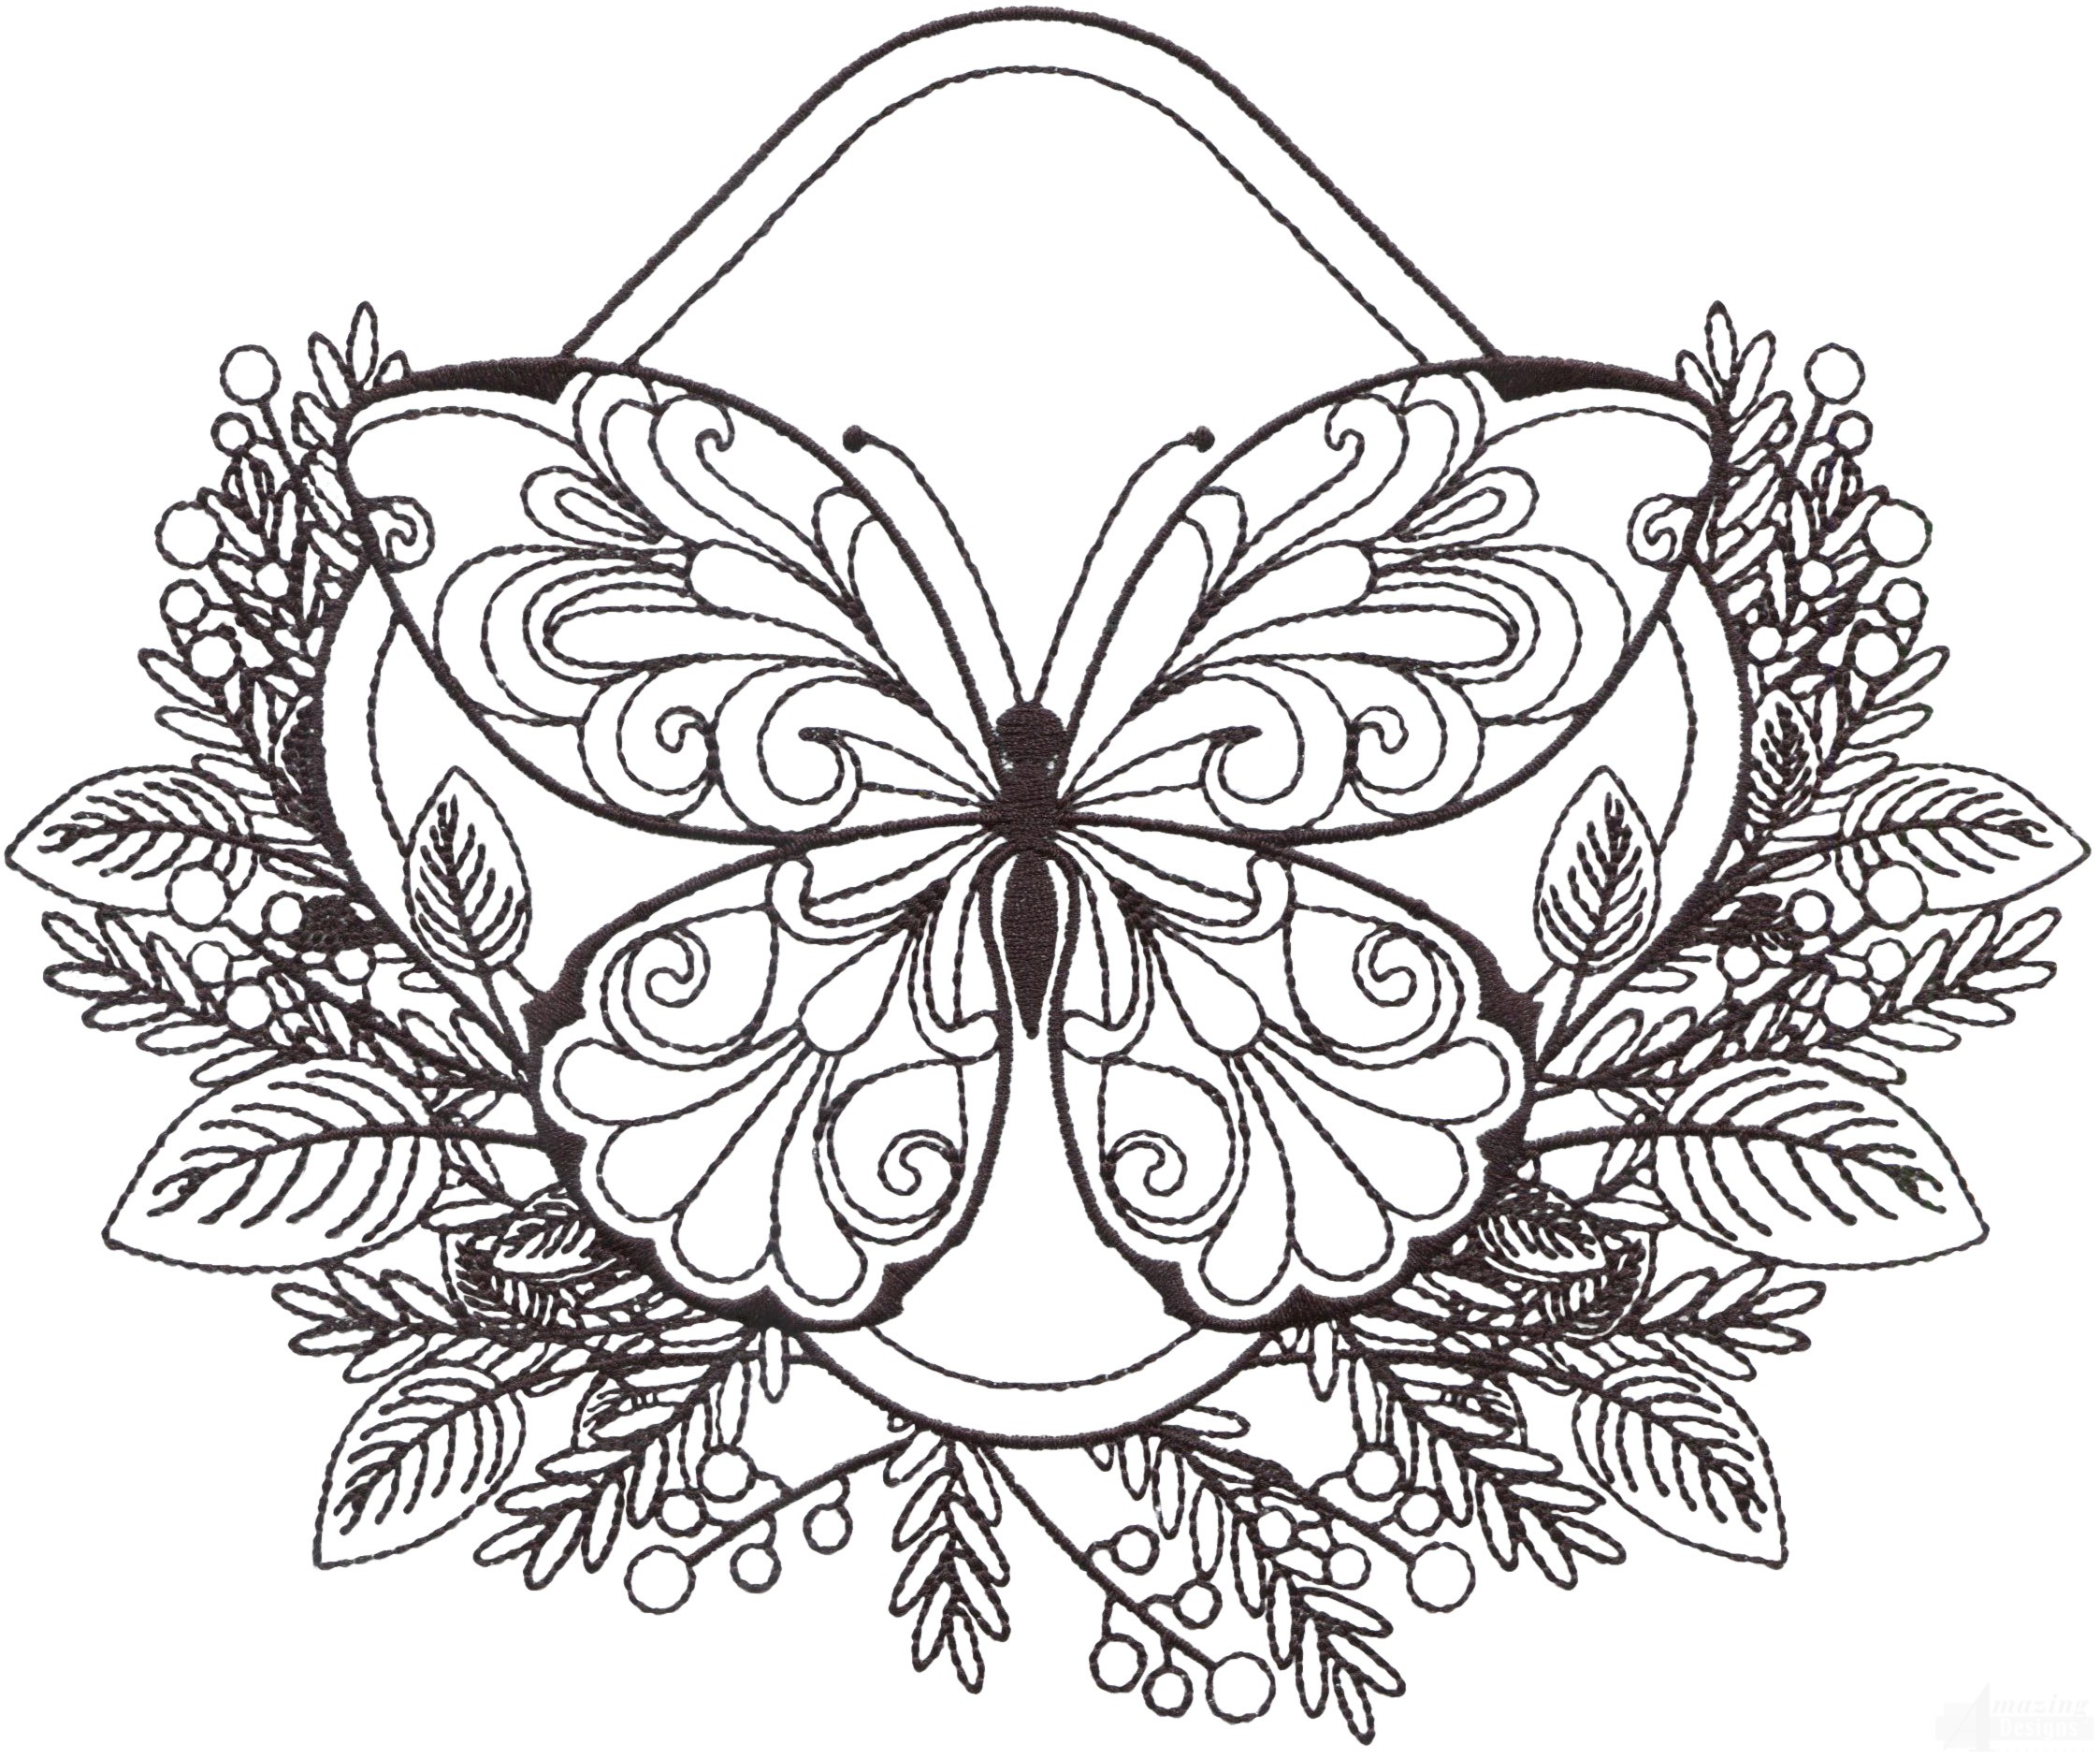 Zen Garden Sketches Embroidery Designs